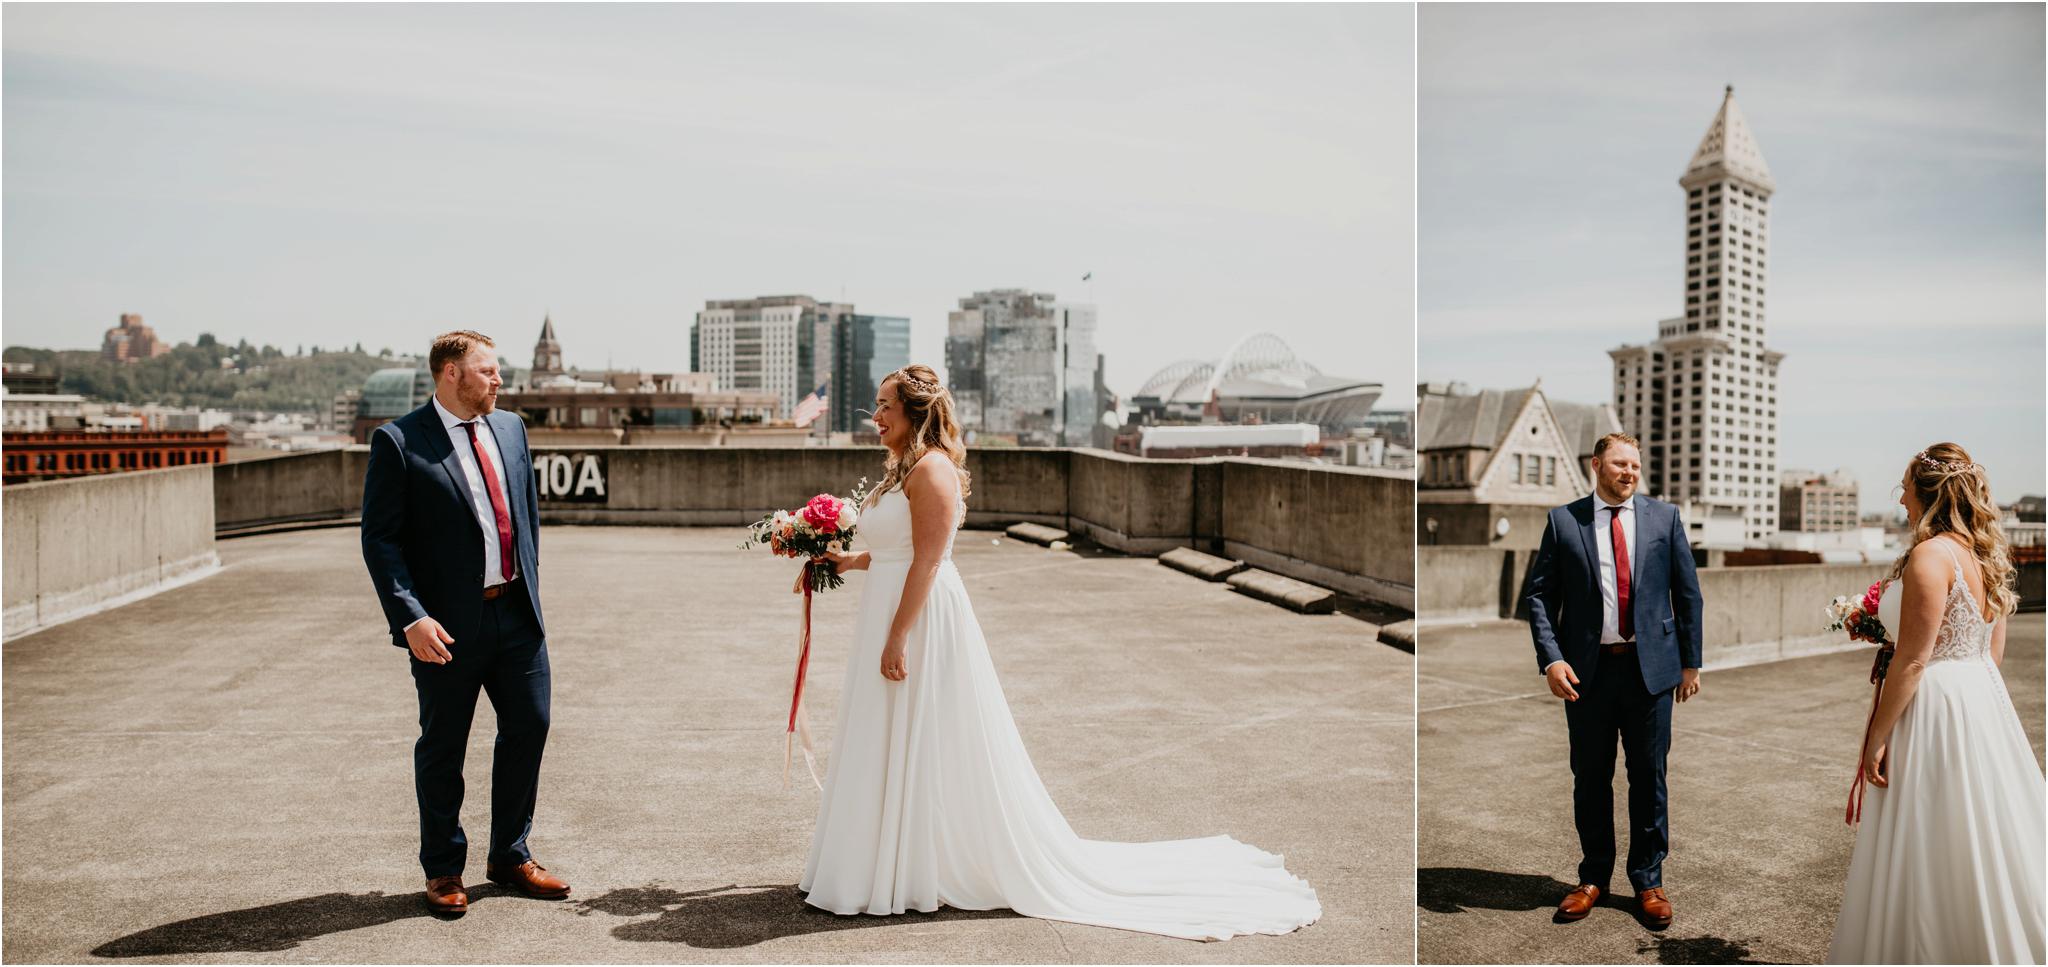 laura-and-matt-metropolist-urban-seattle-wedding-photographer-036.jpg